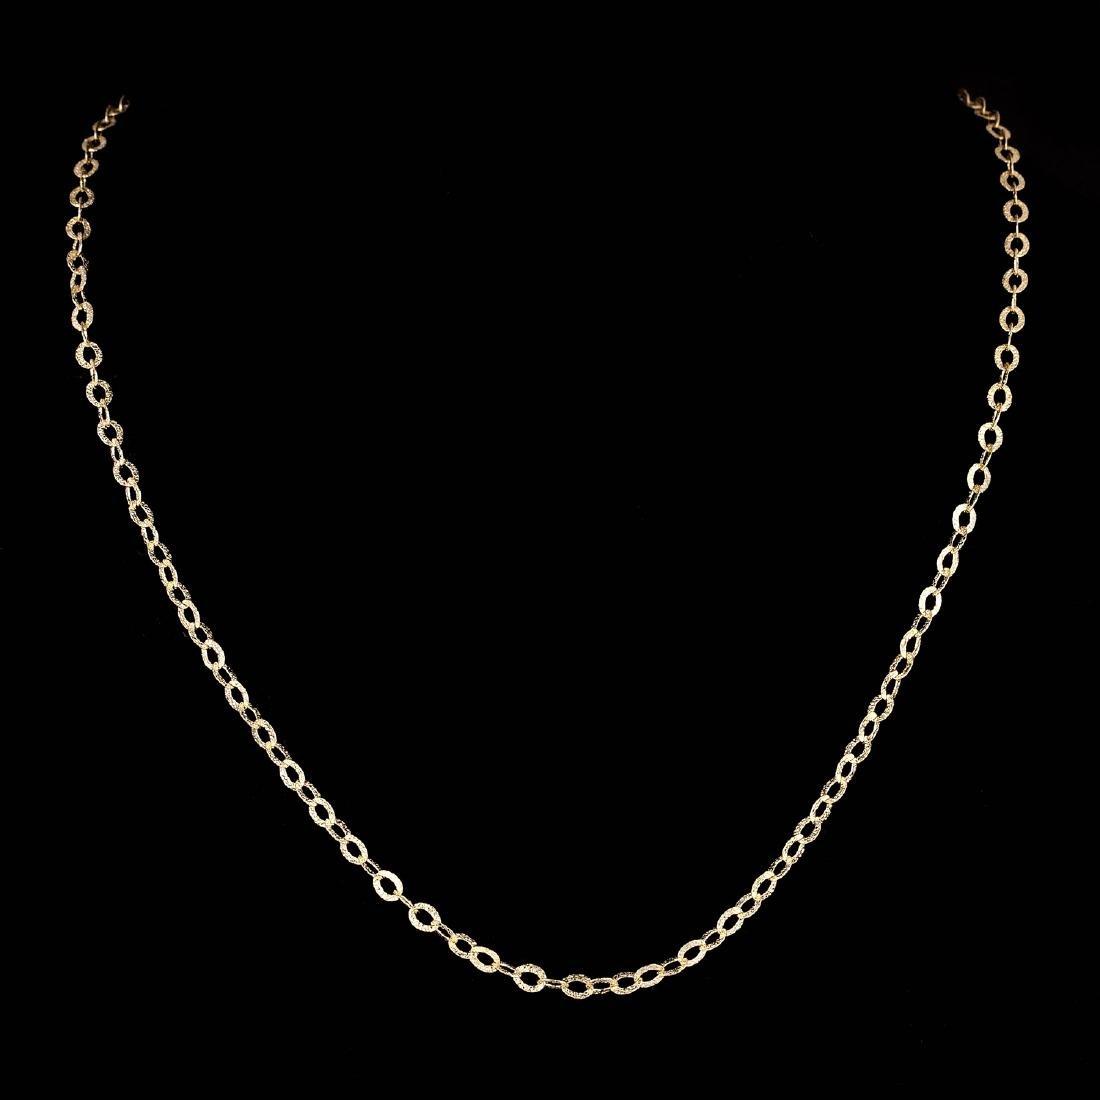 *Fine Jewelry 14 KT Gold, 3.1GR, 16'' Corrugated Oval